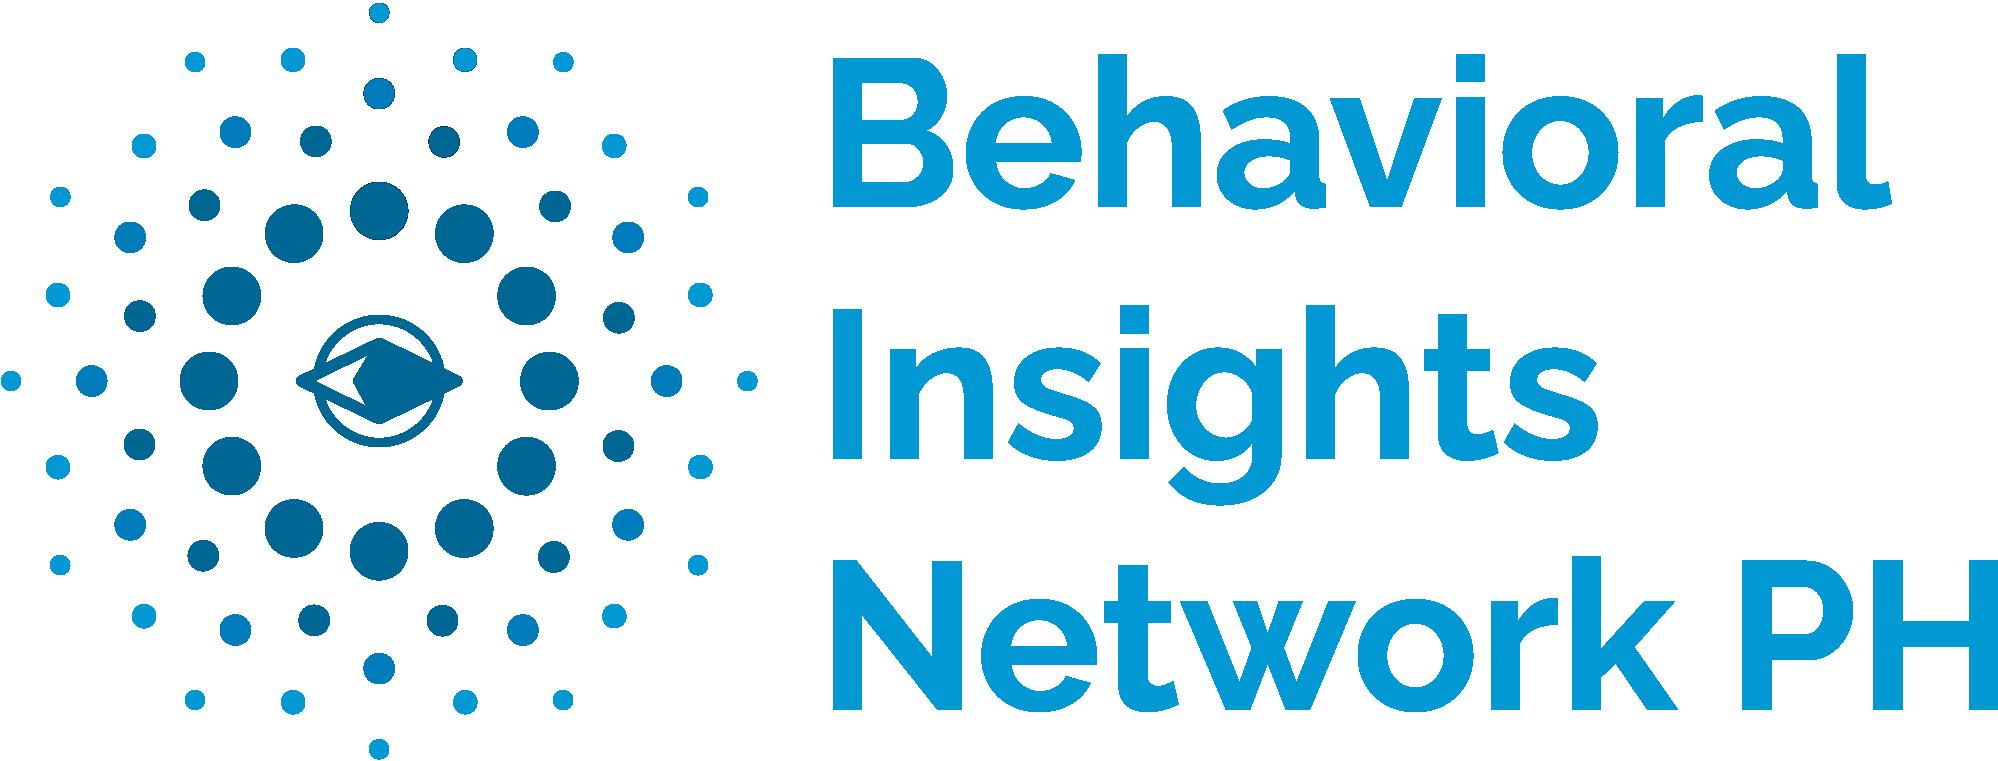 Behavioral Insights Network PH